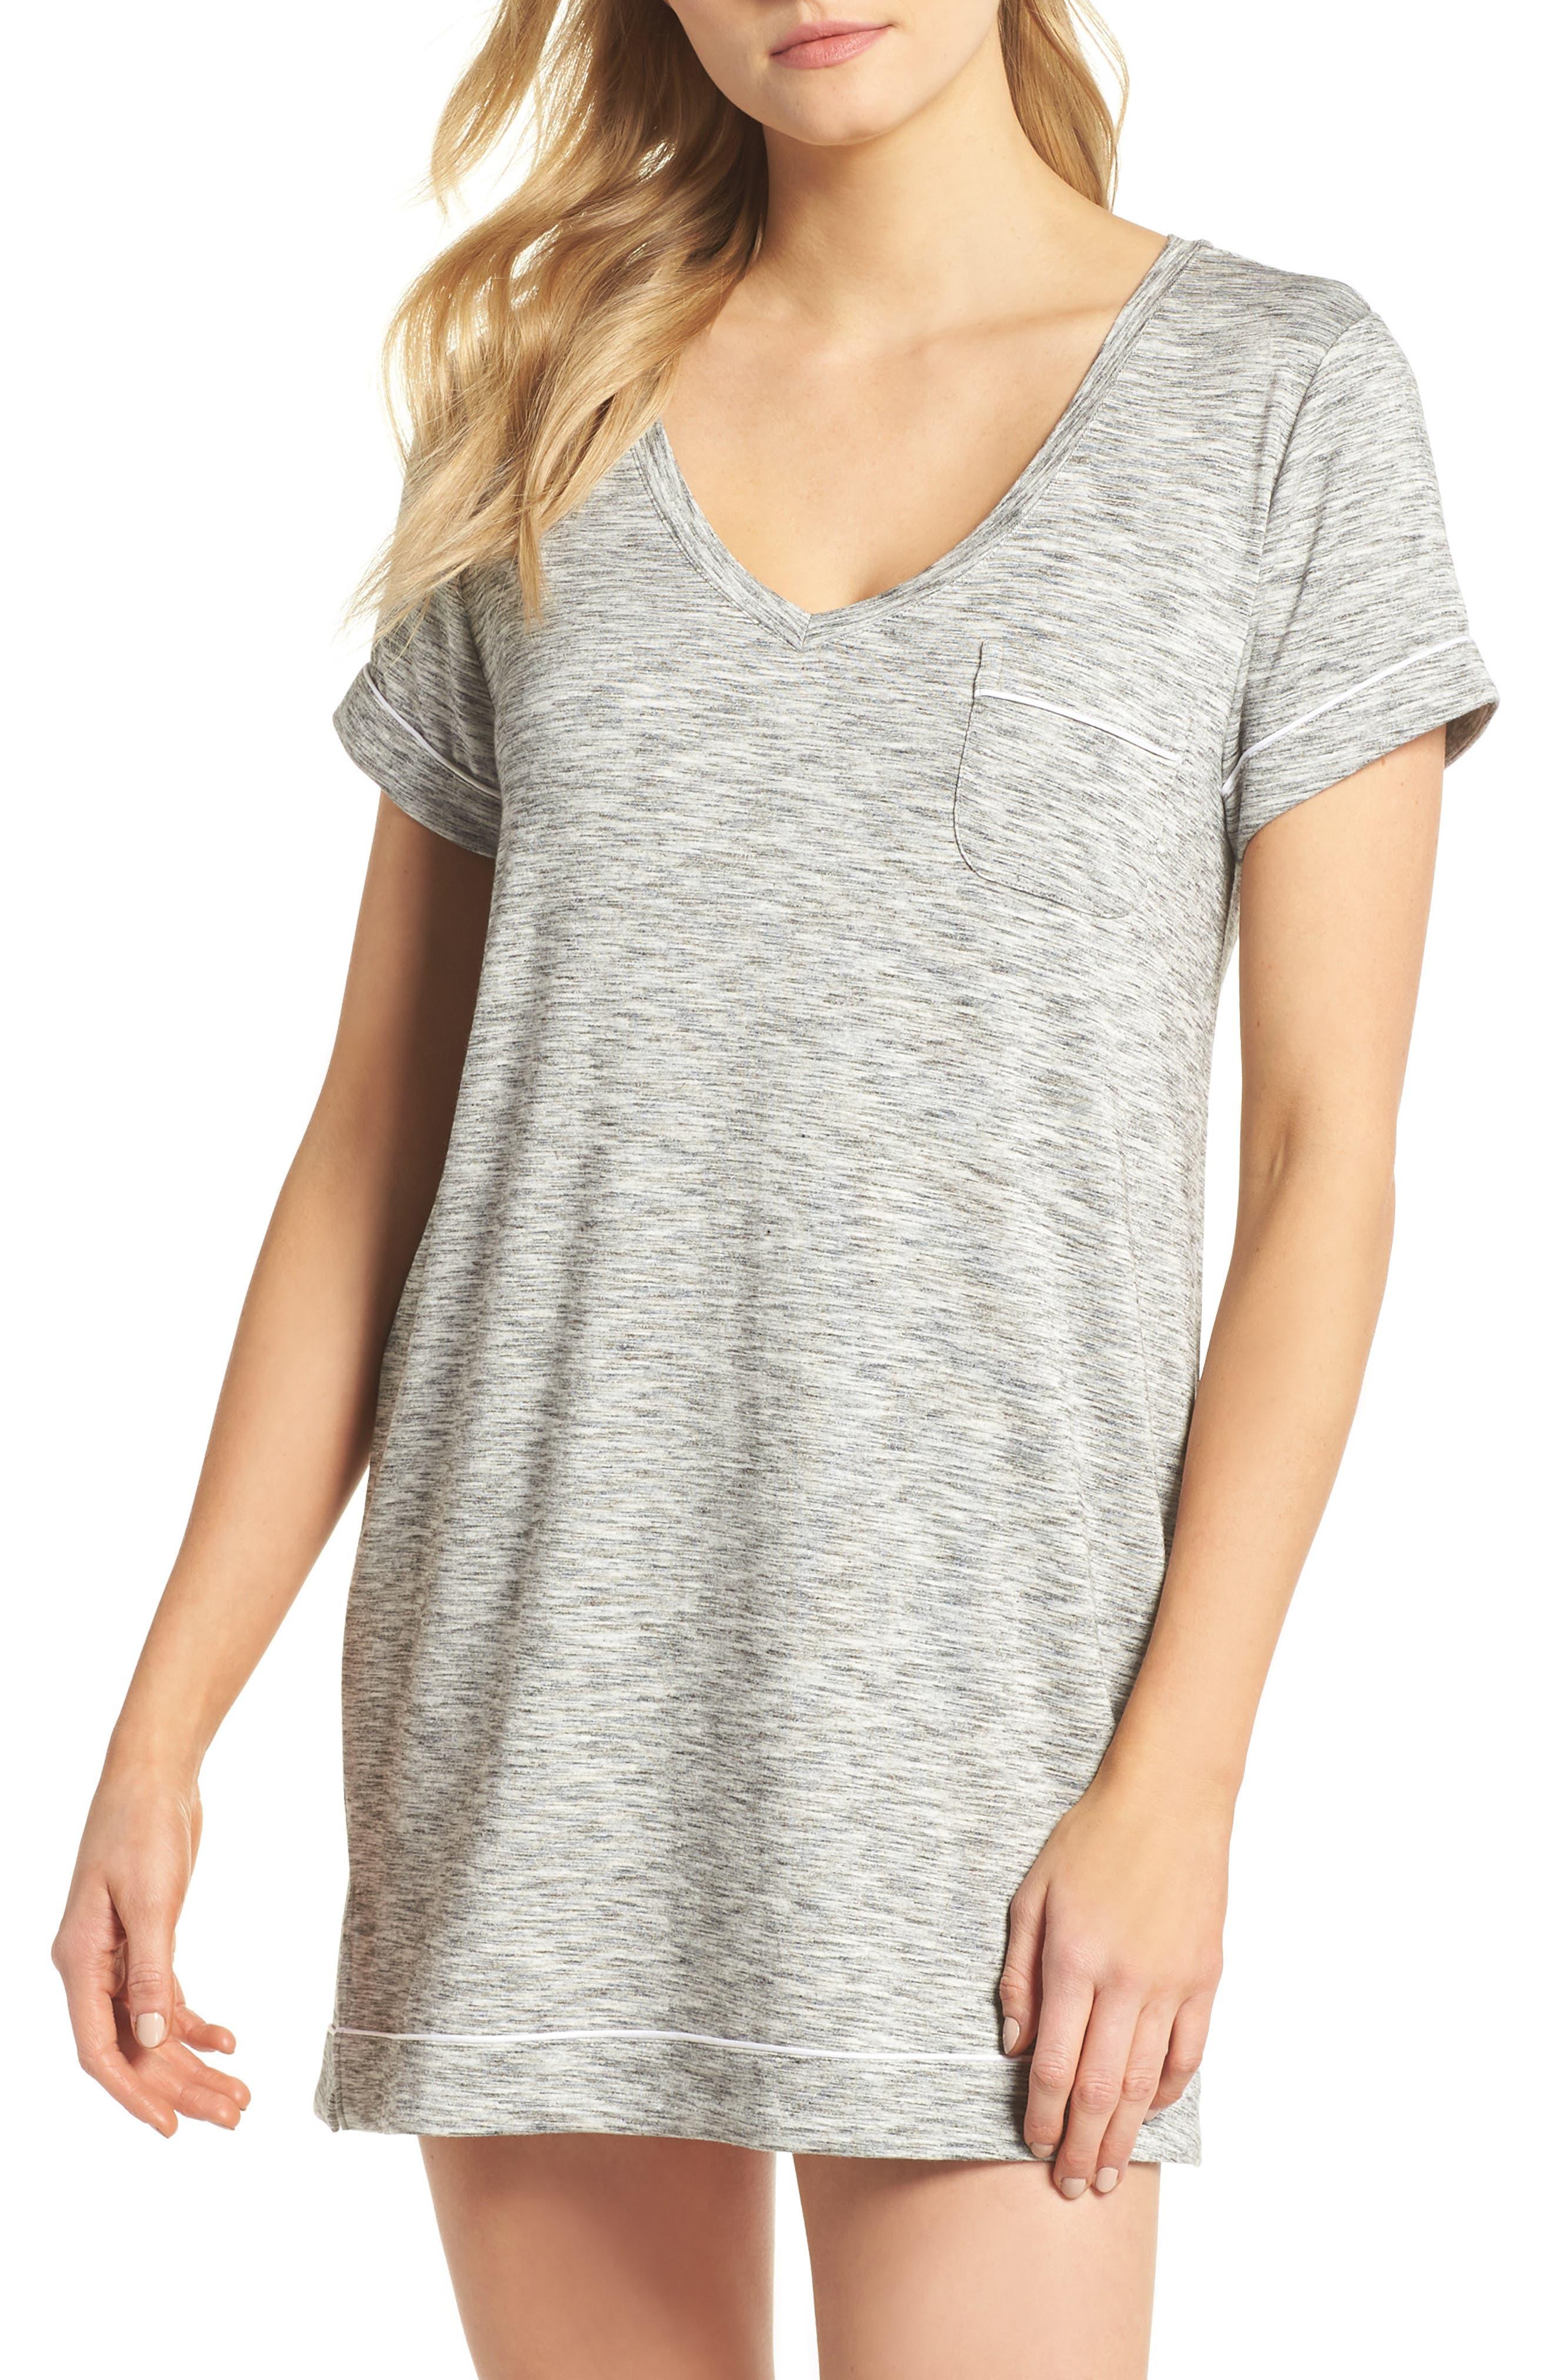 Moonlight Sleep Shirt,                         Main,                         color, GREY SPACEDYE